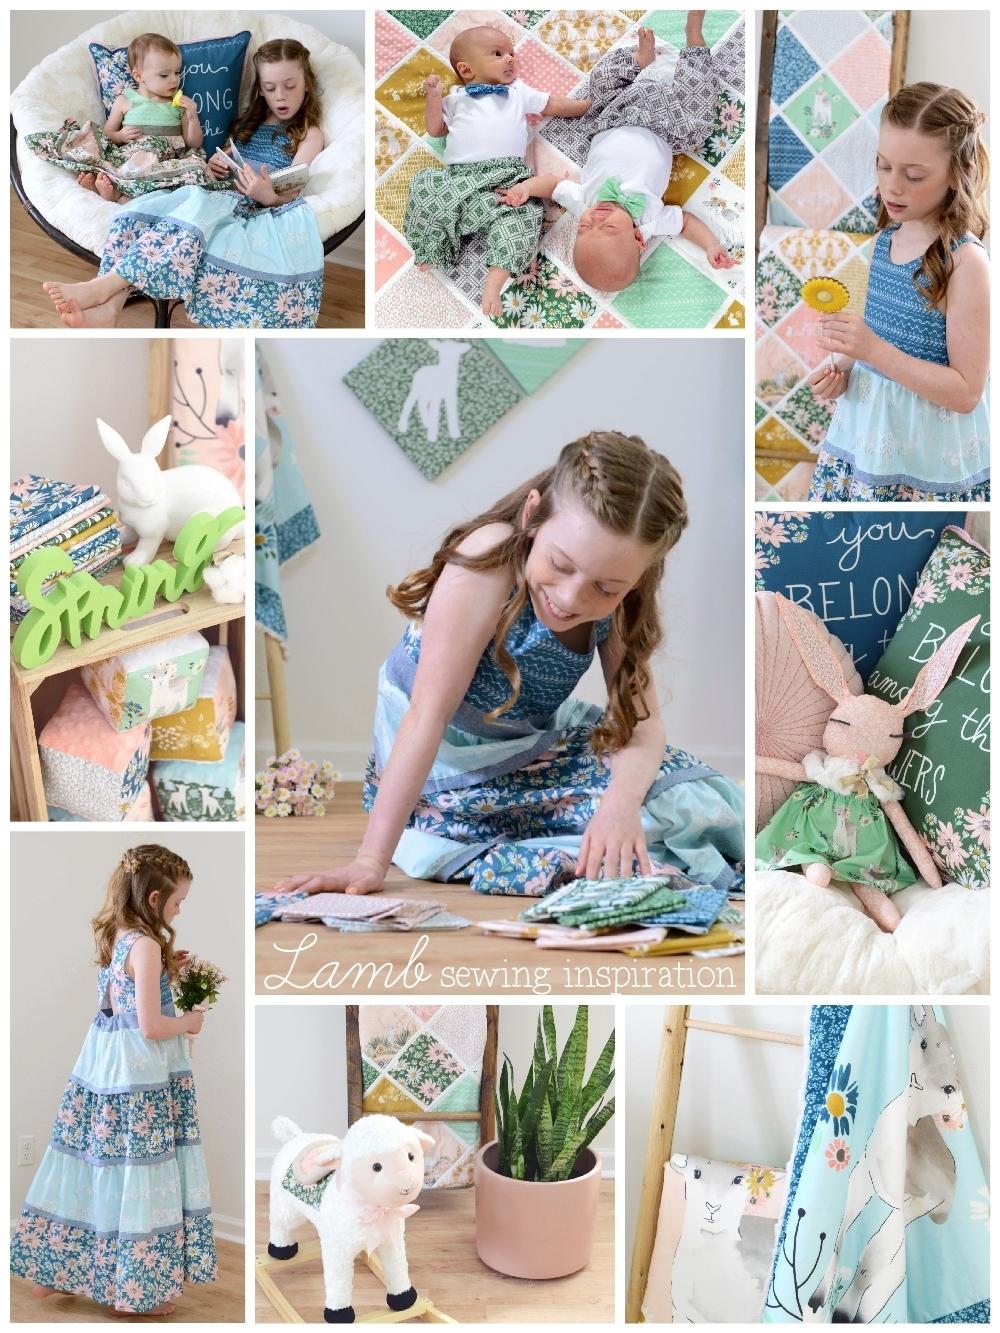 Lamb Fabric Sewing Inspiration 1000